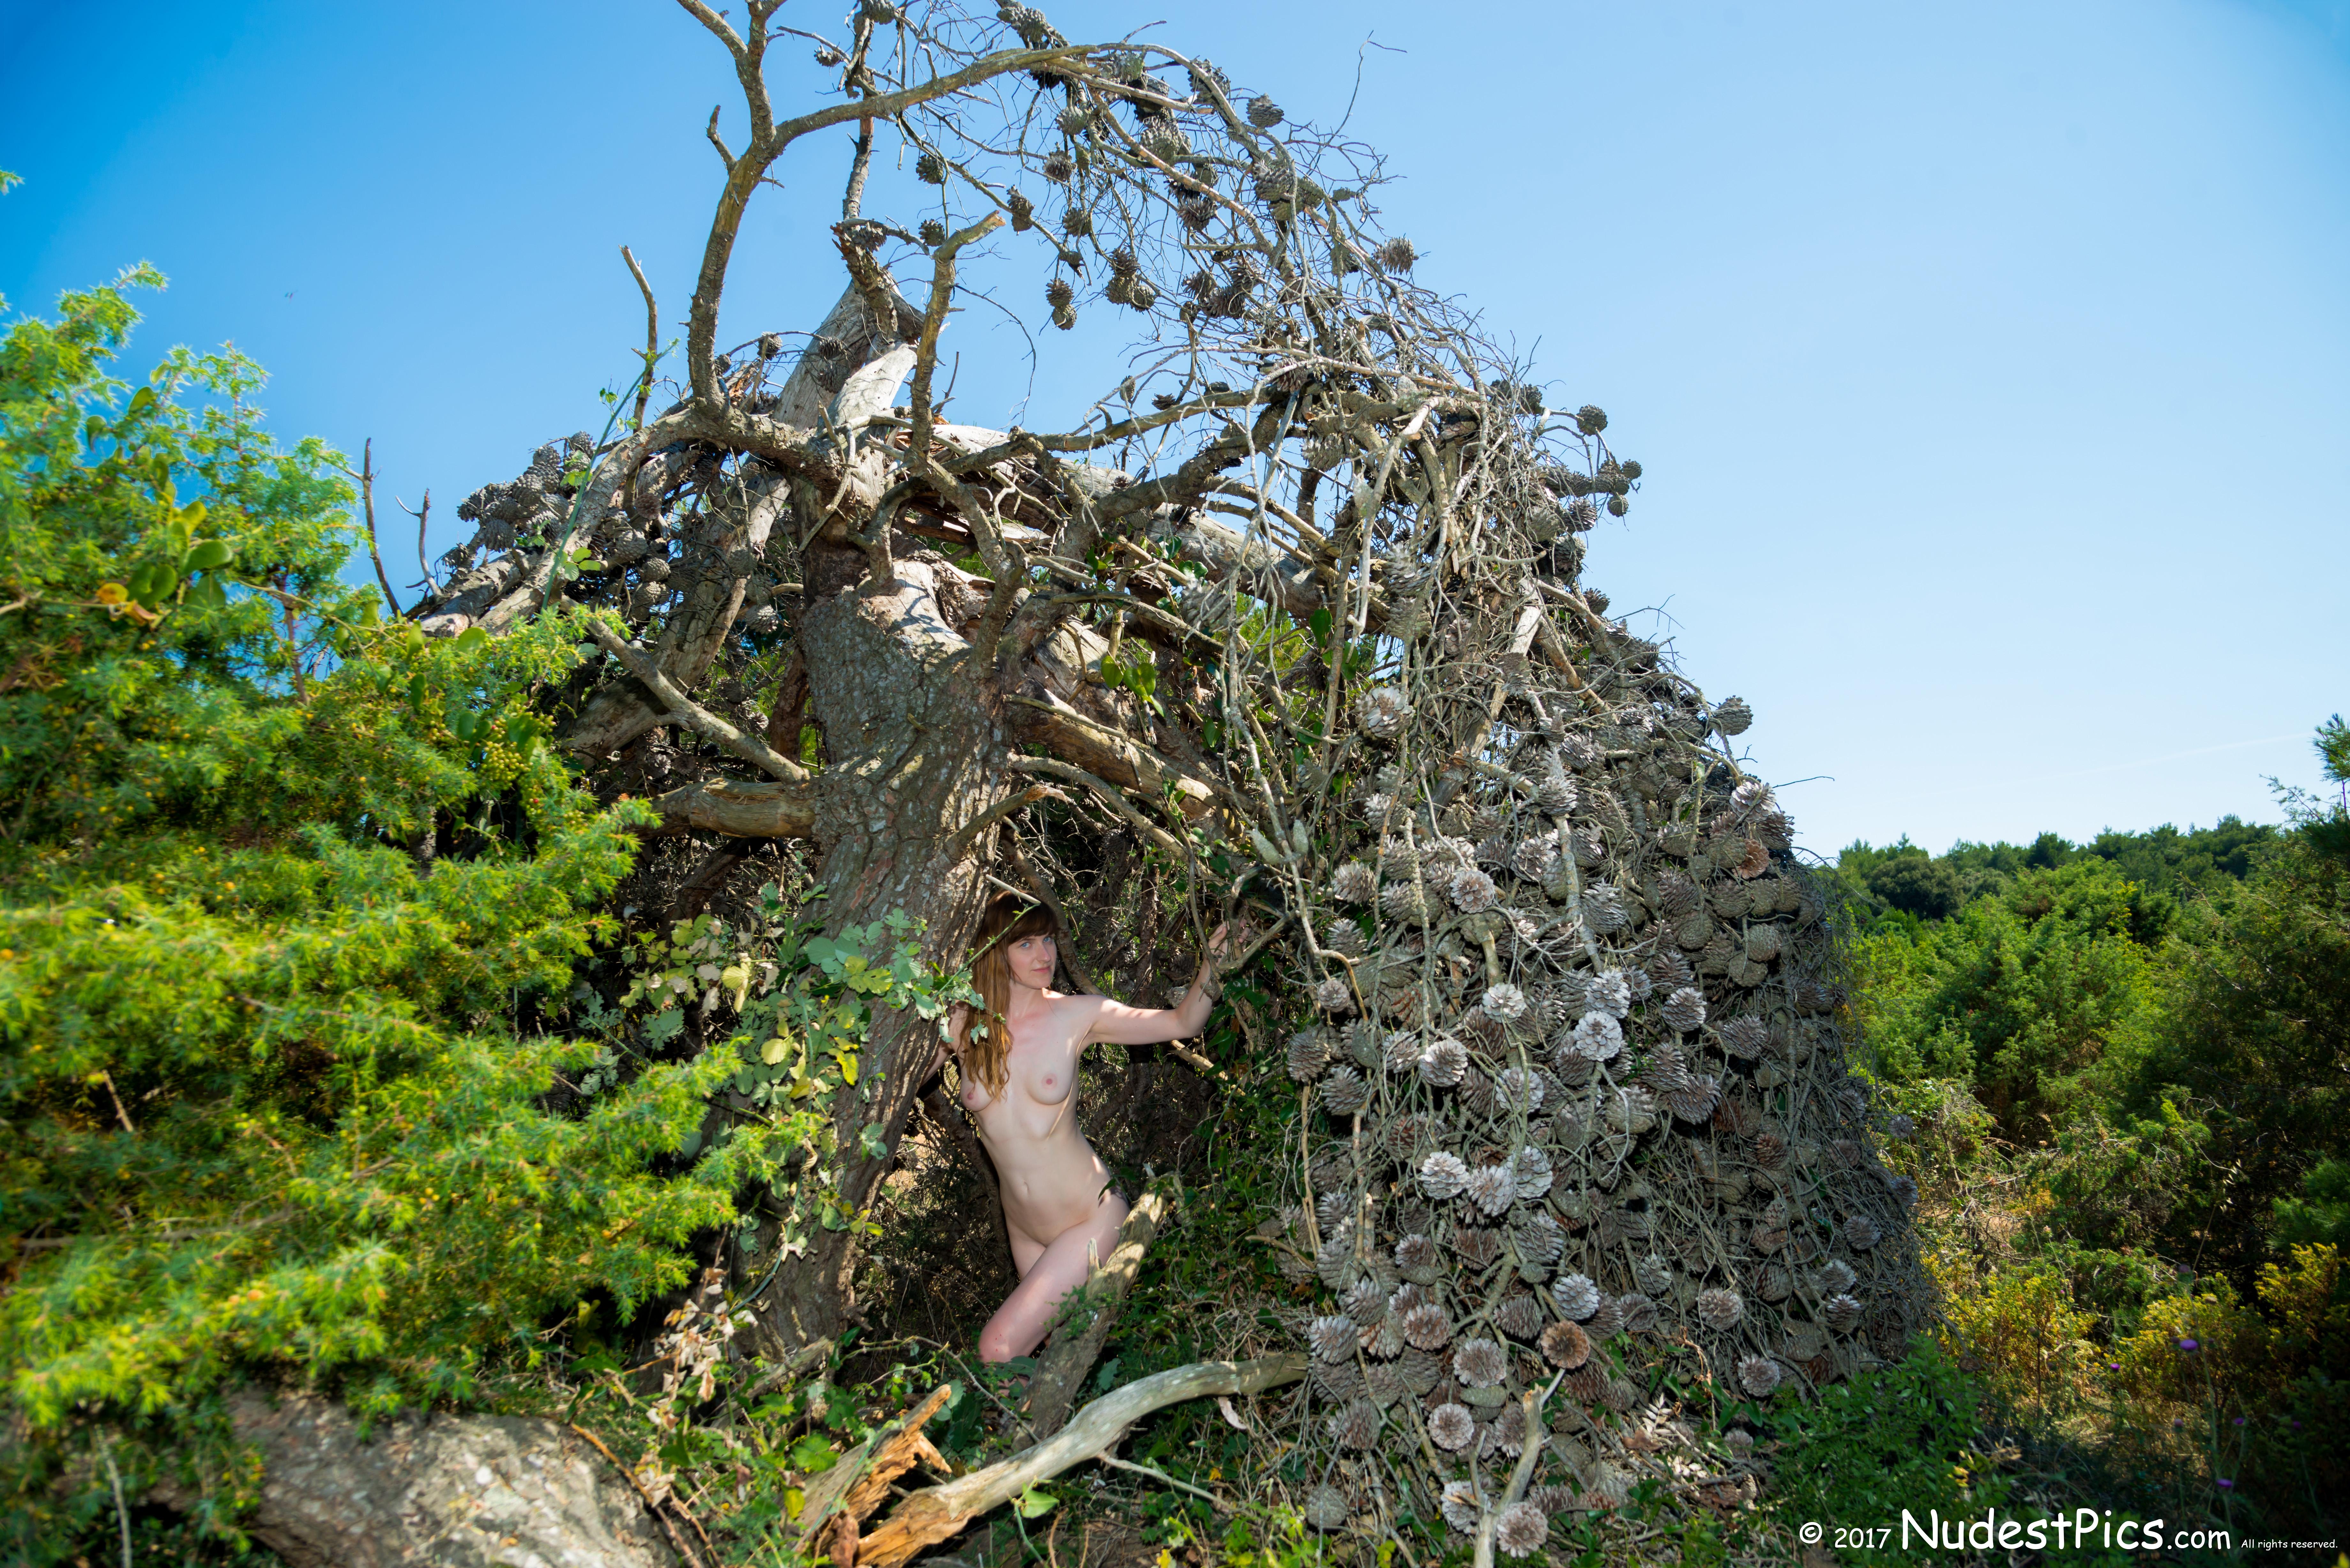 Nudist Girl in her Wild Hut HD